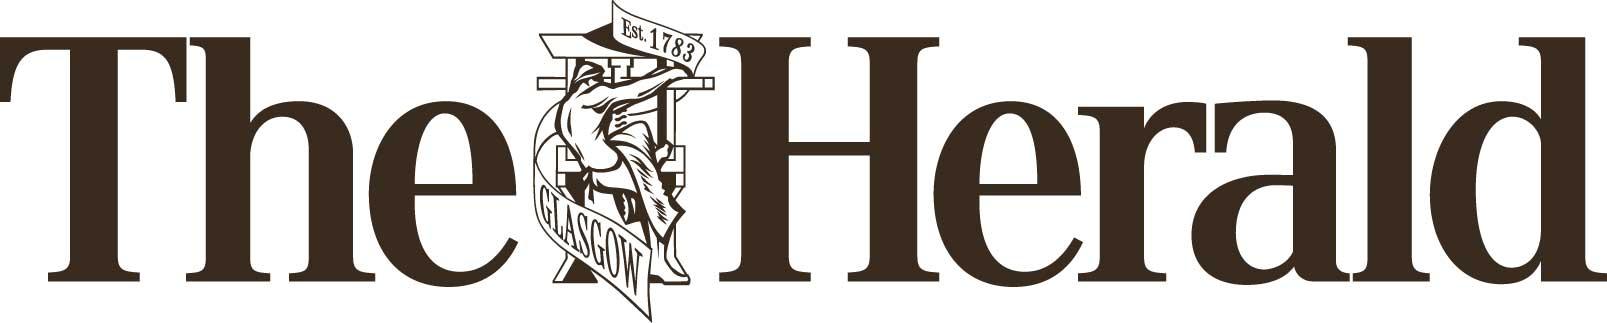 Herald-logo.jpg